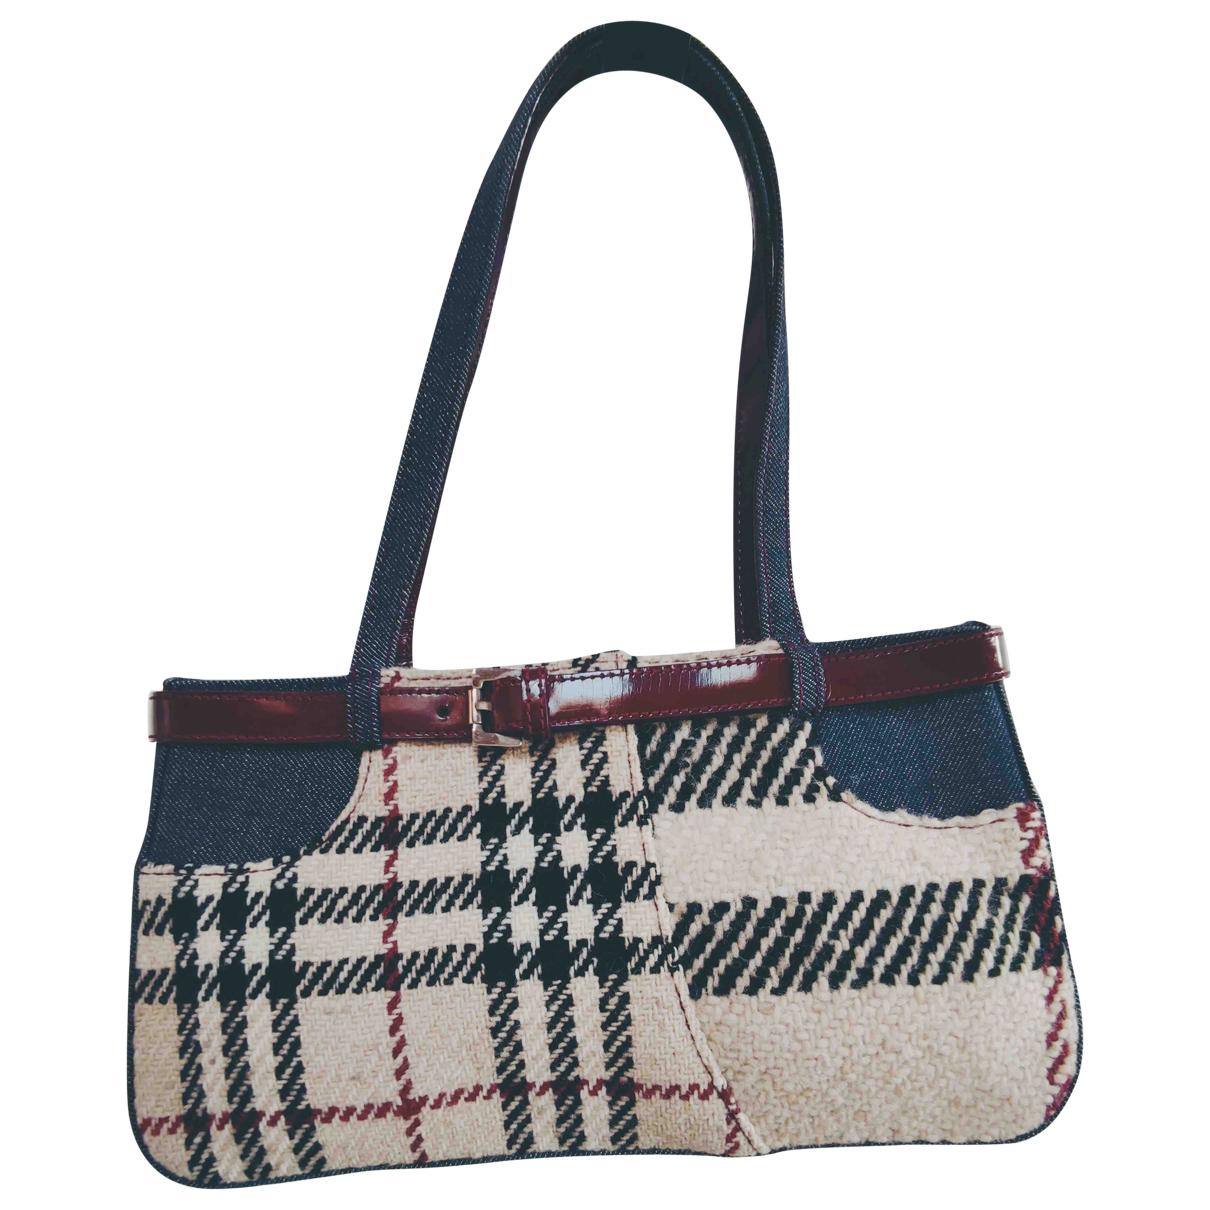 Burberry \N Beige Denim - Jeans handbag for Women \N